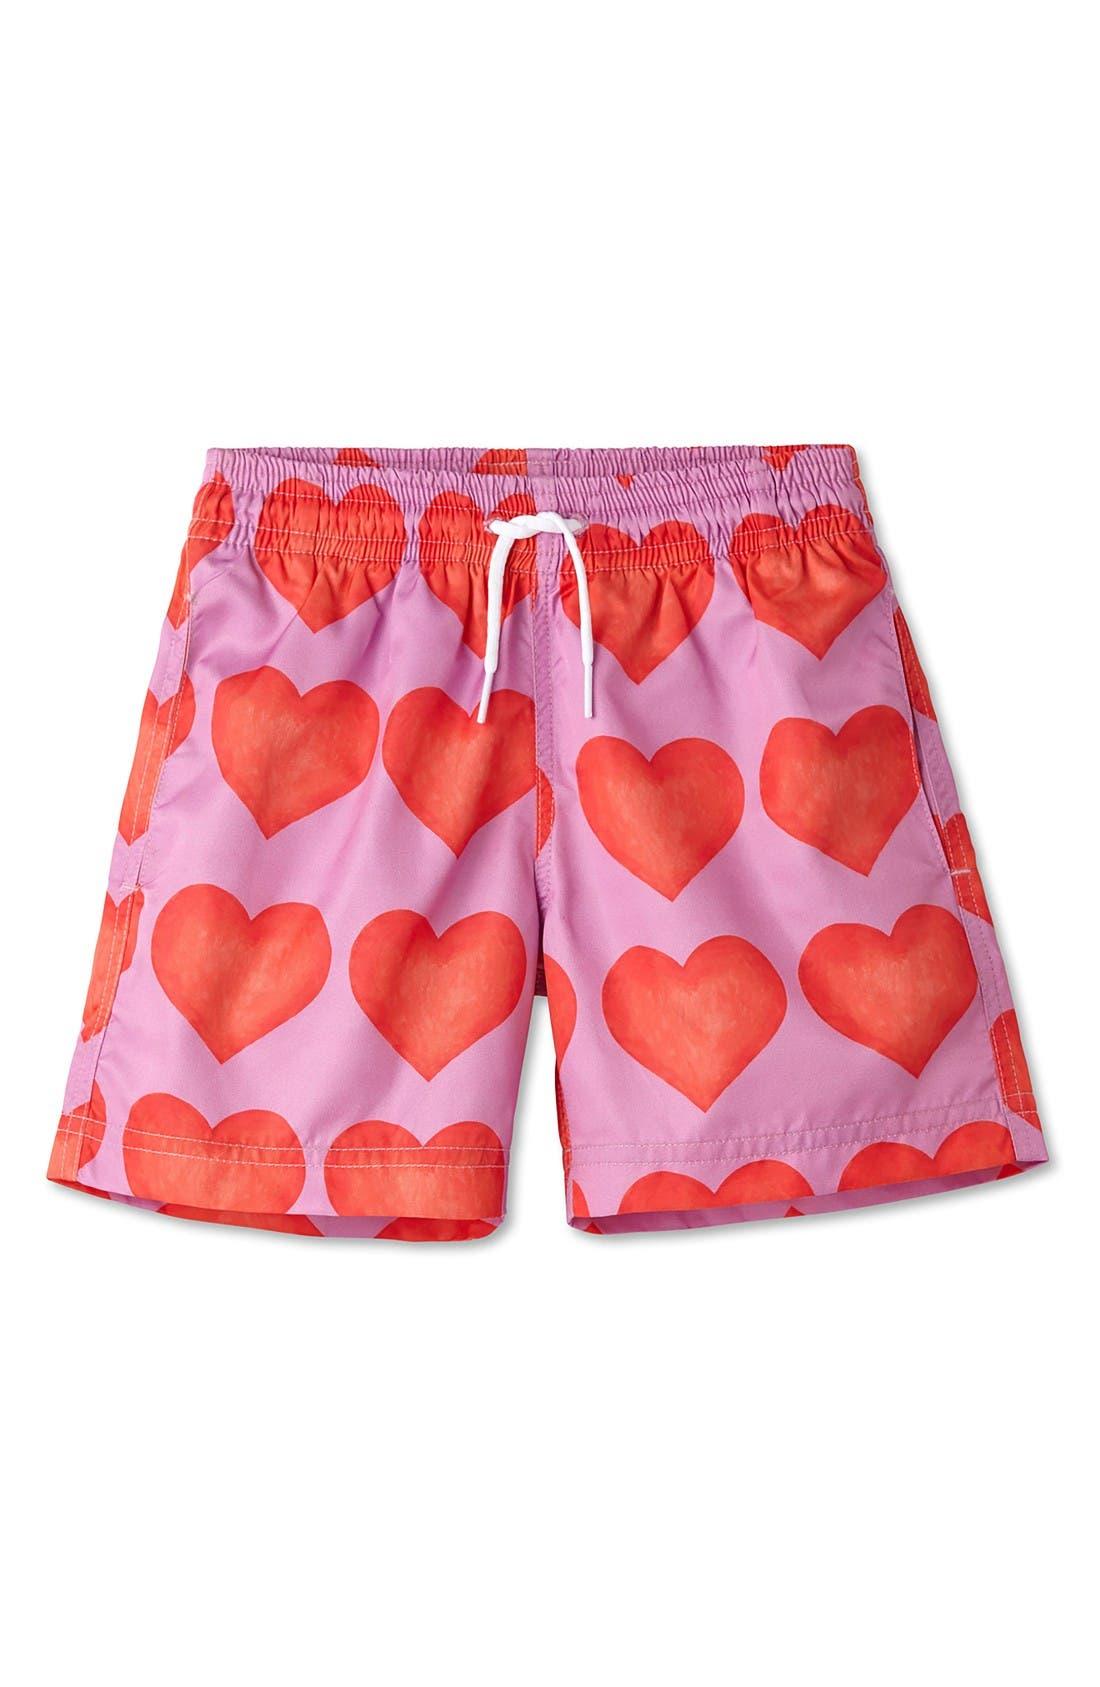 Heart Print Swim Trunks,                         Main,                         color, Pink